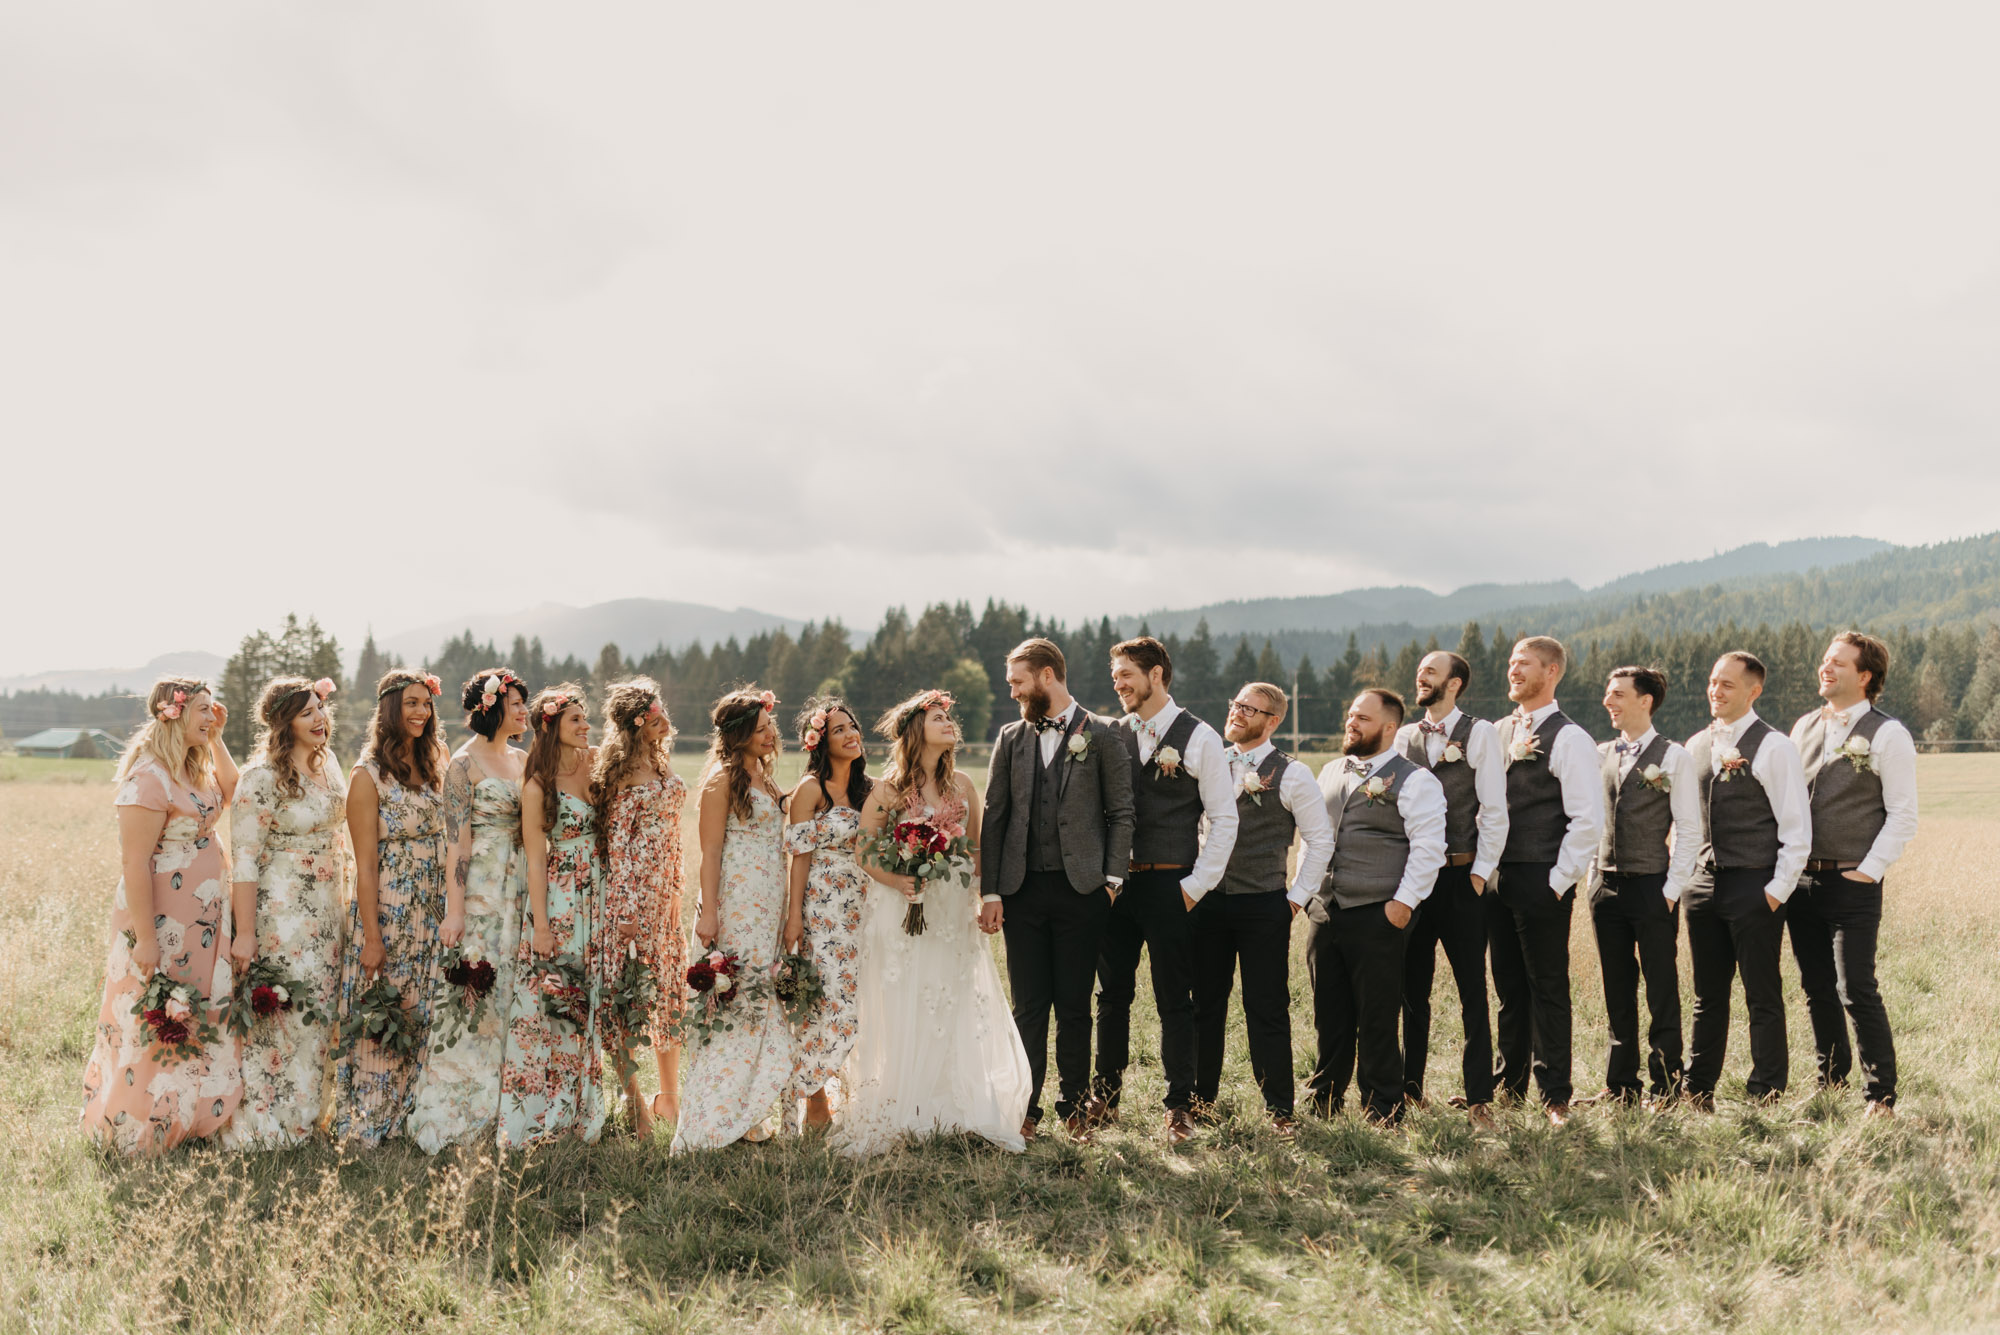 Bridal-Party-Free-People-Flower-Dresses-Washington-Wedding-8594.jpg